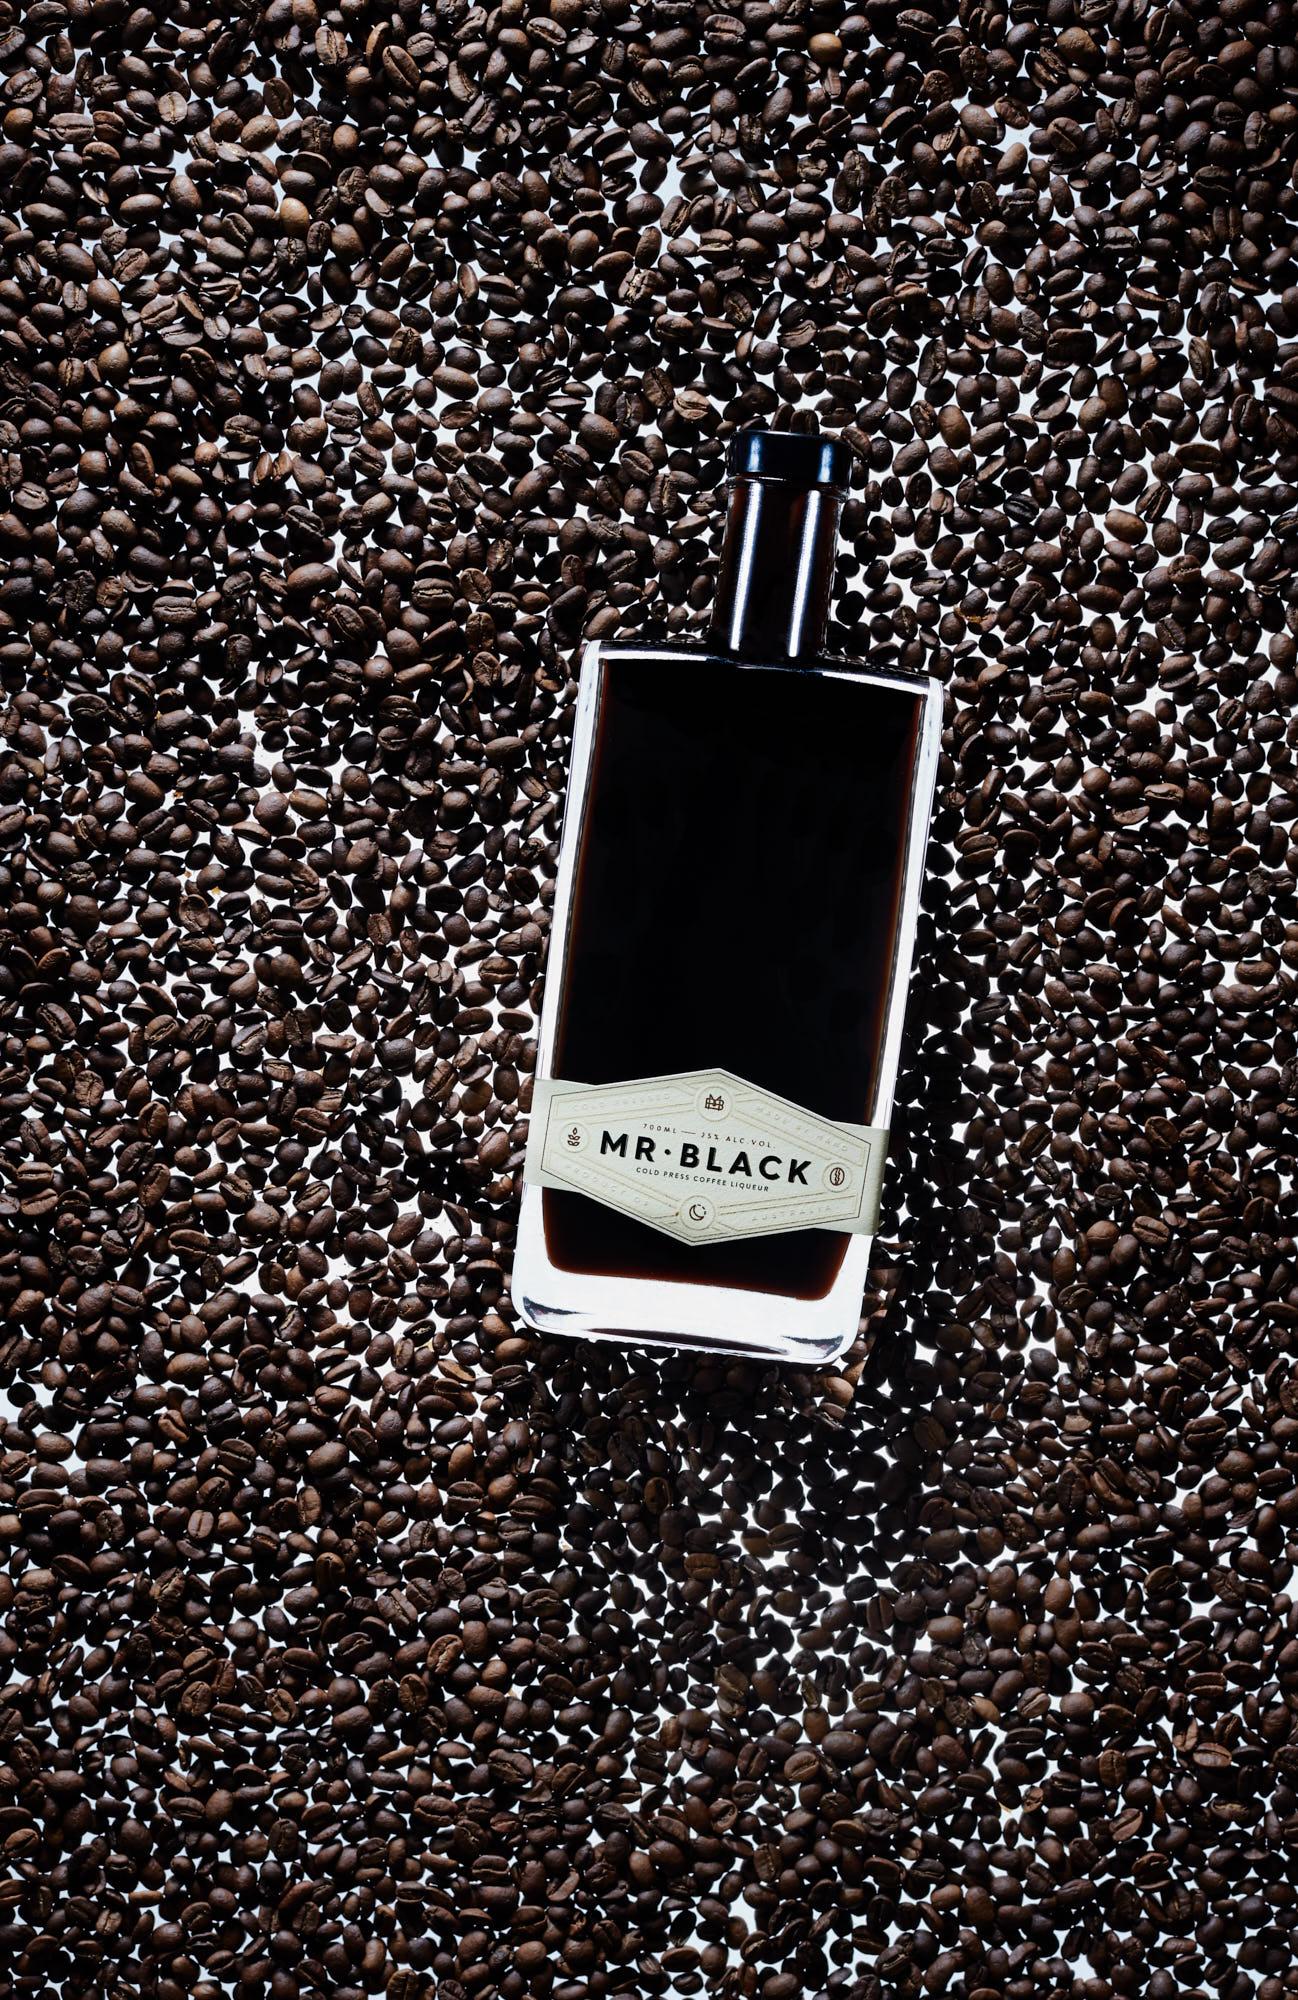 Mr Black Cold Pressed Coffee Liquor